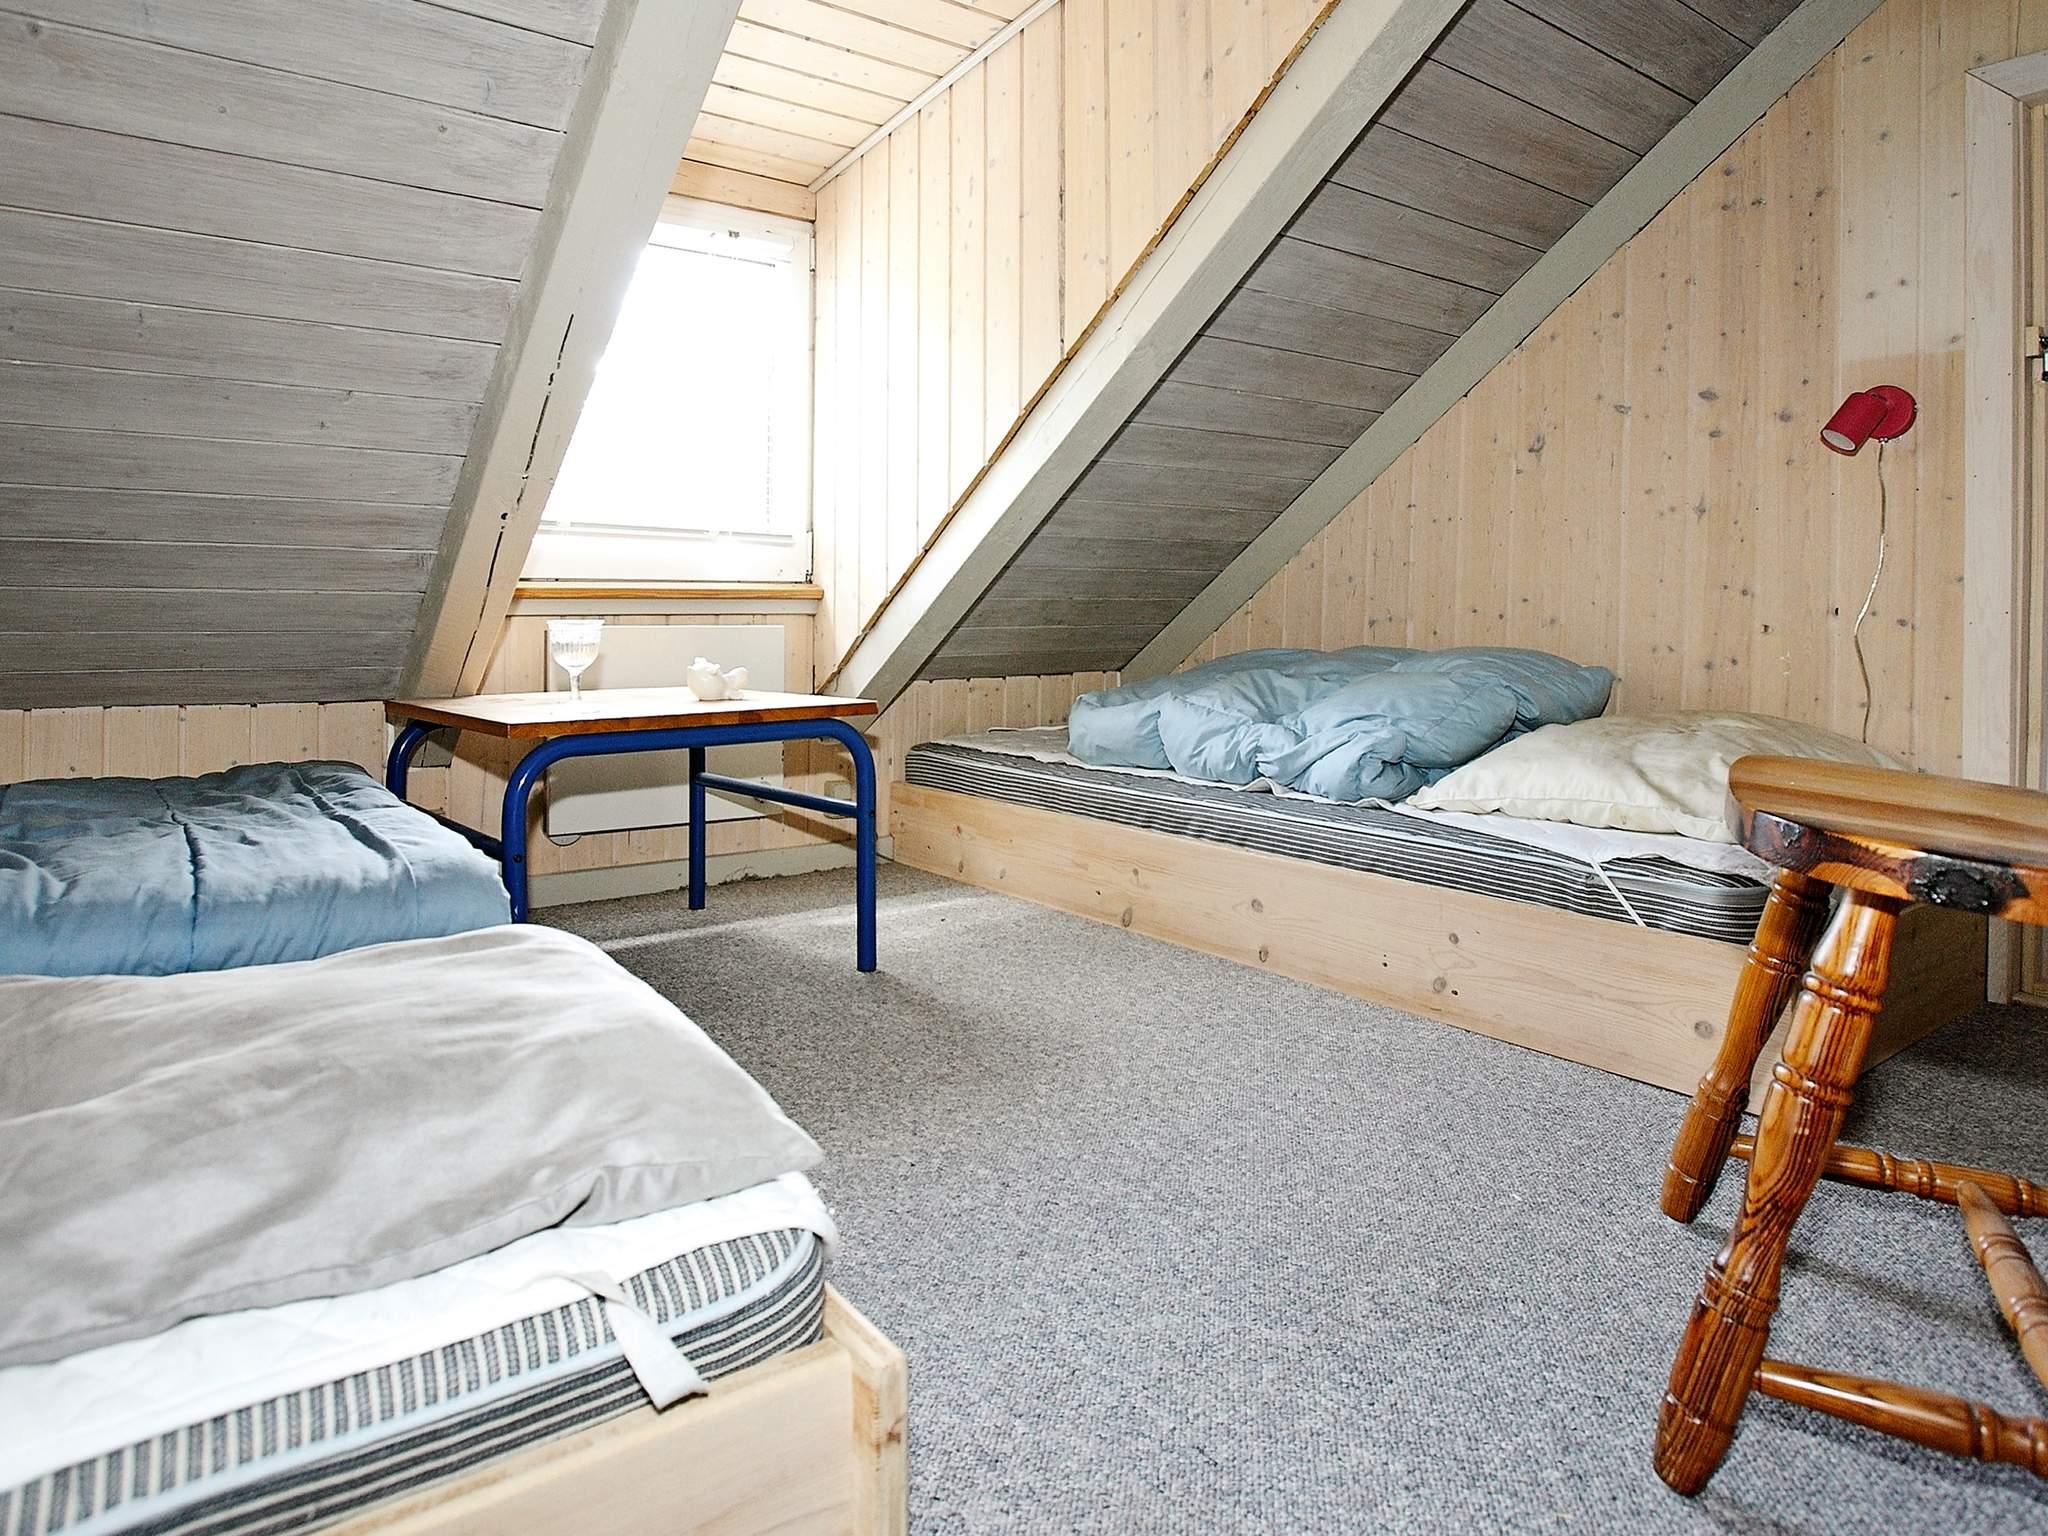 Ferienhaus Øster Hurup (88055), Øster Hurup, , Ostjütland, Dänemark, Bild 11